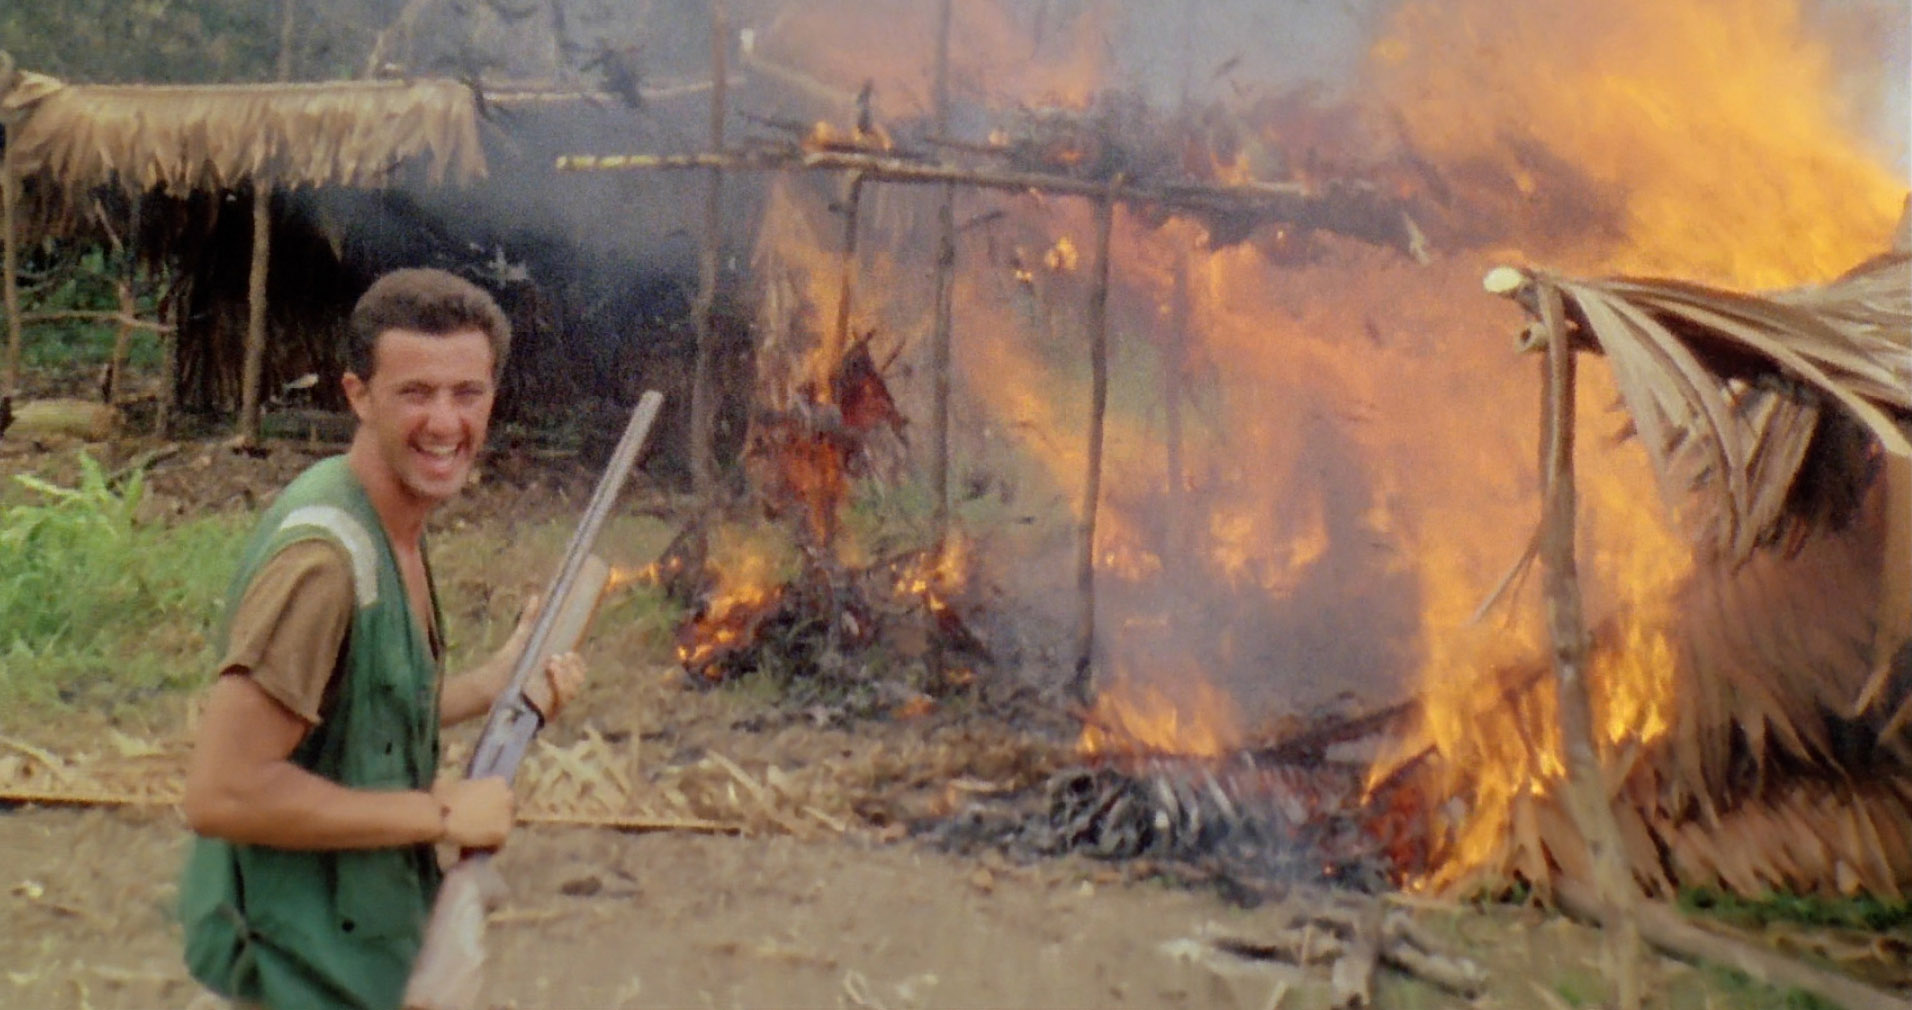 Cannibal holocaust rape scene video